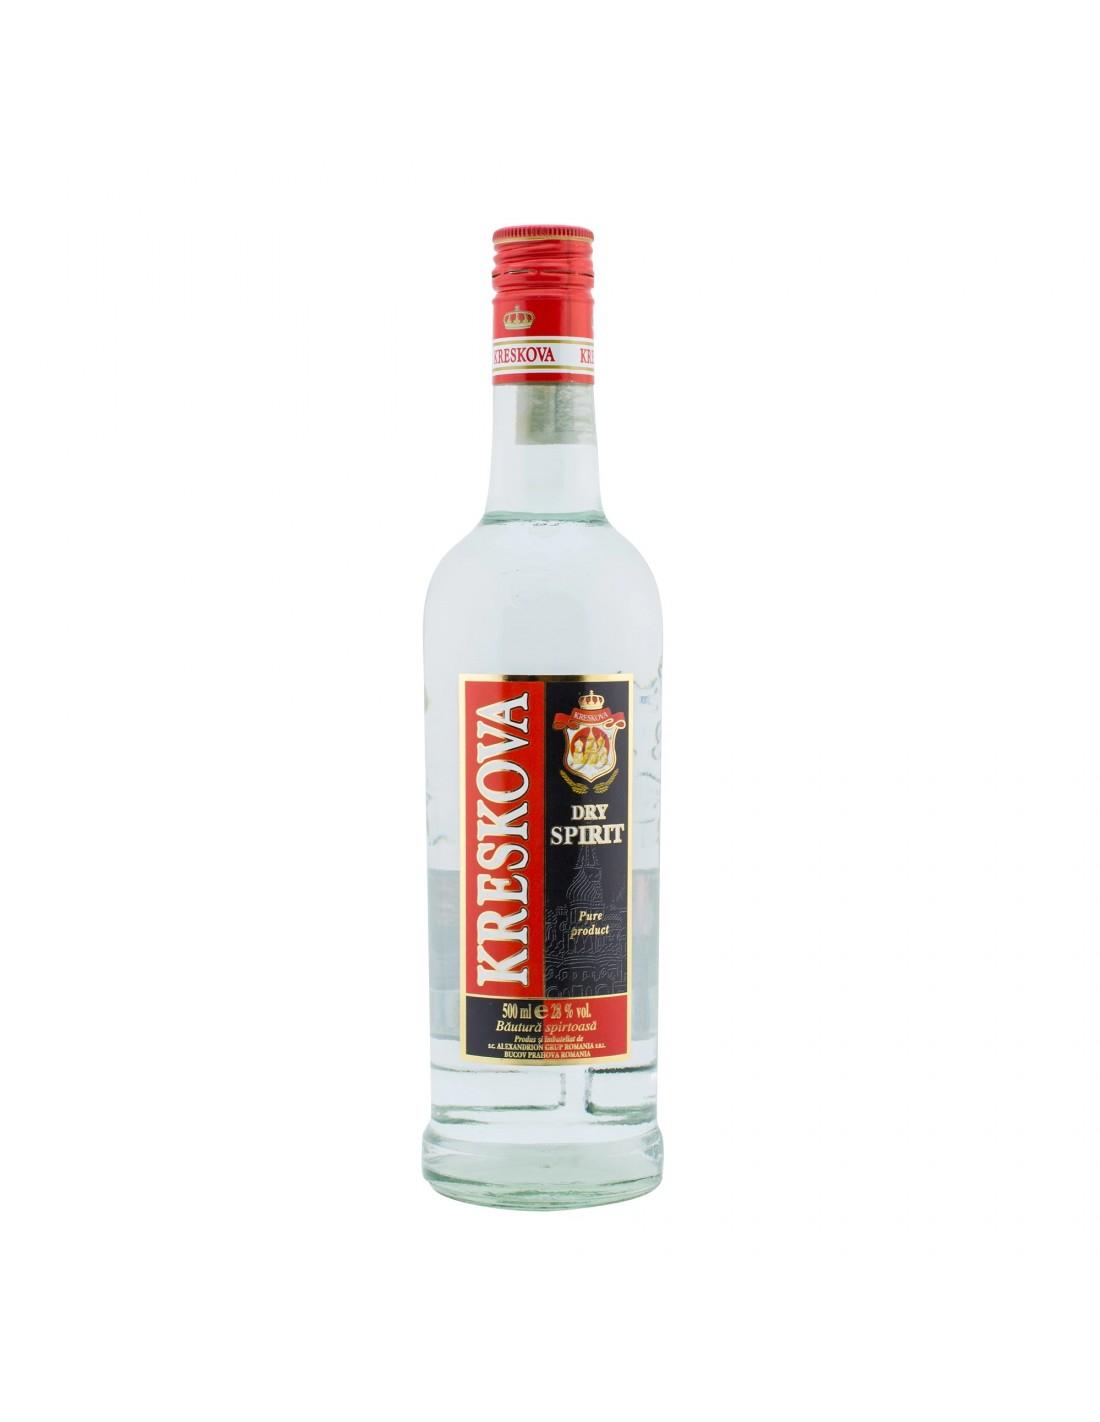 Vodca Kreskova 0.5L, 28% alc., Romania